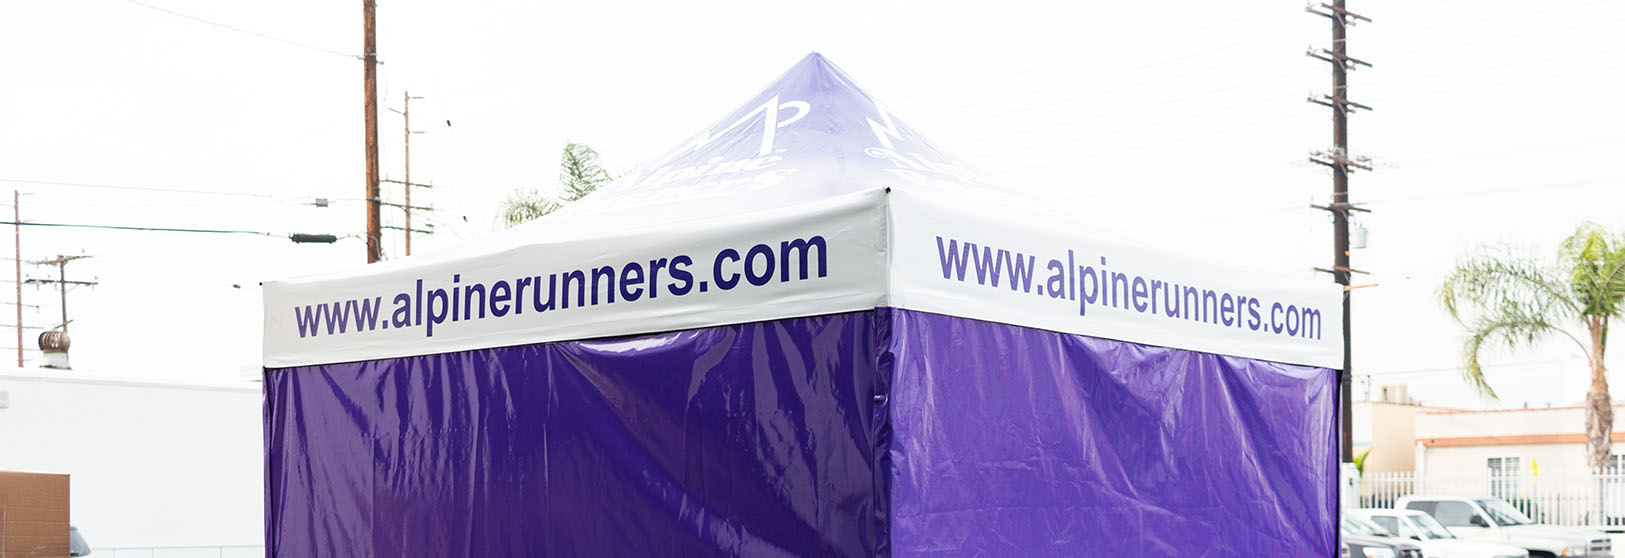 alpine-runners-header.jpg